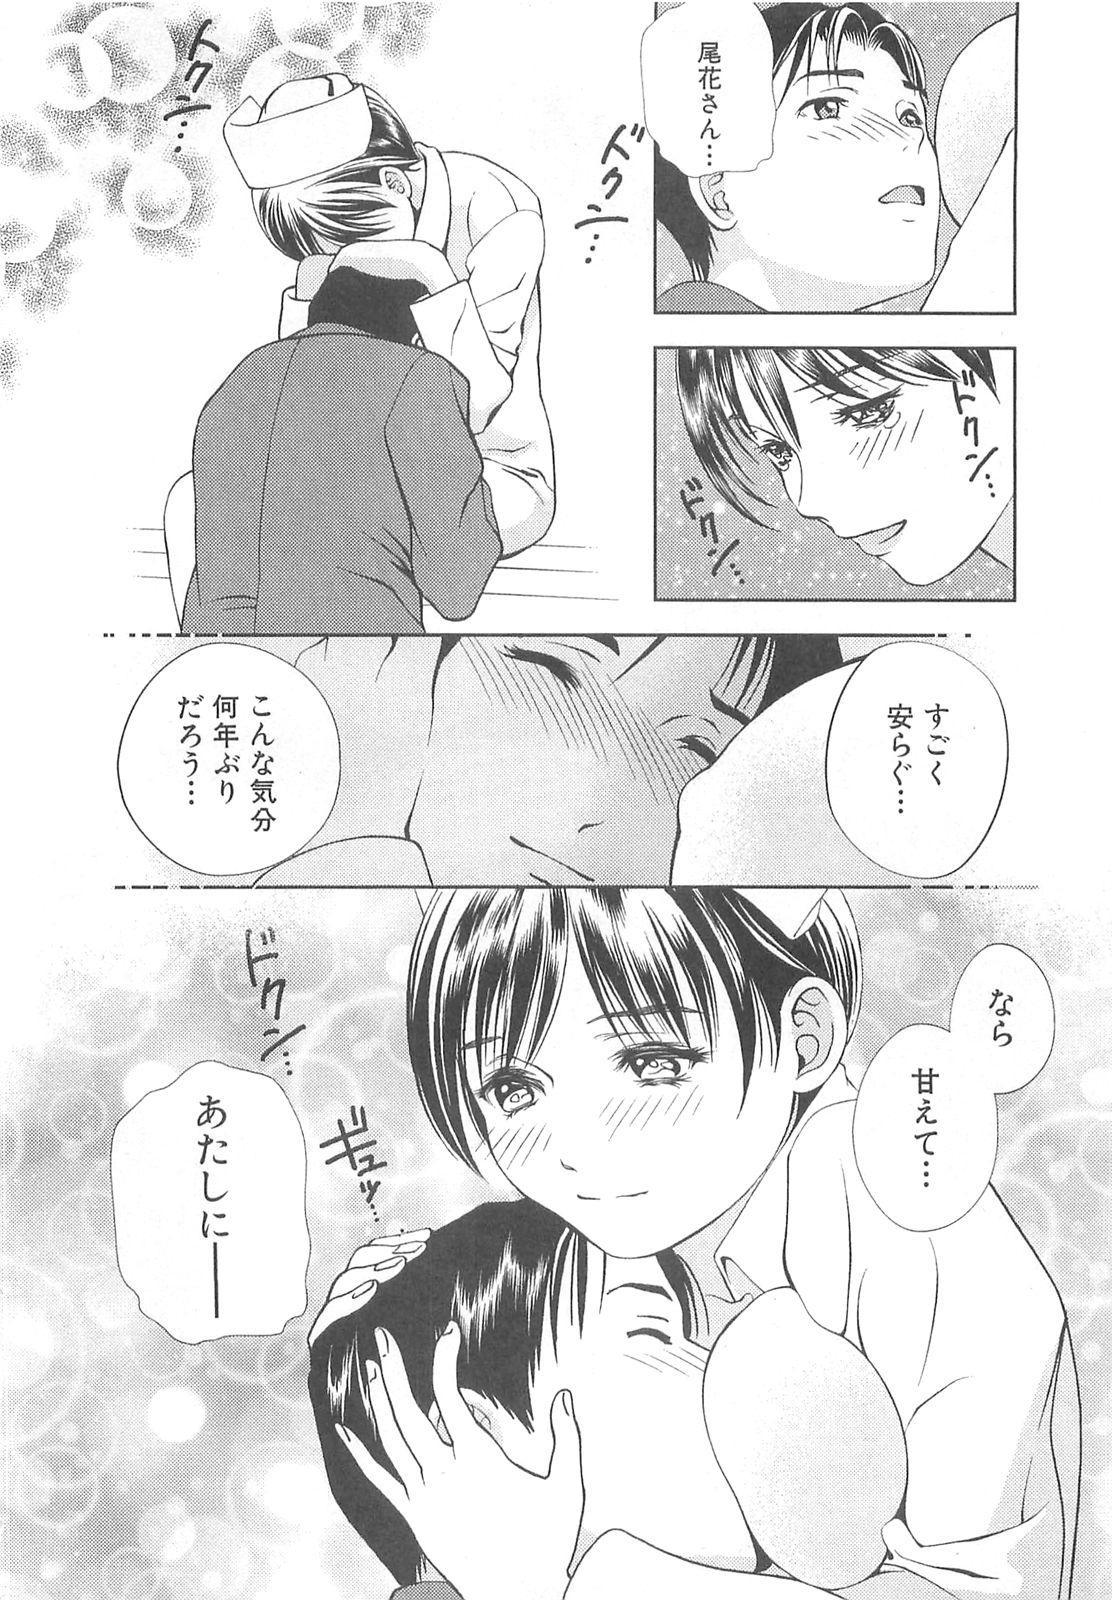 Tenshi no Kyuu - Angel's Pretty Hip 96